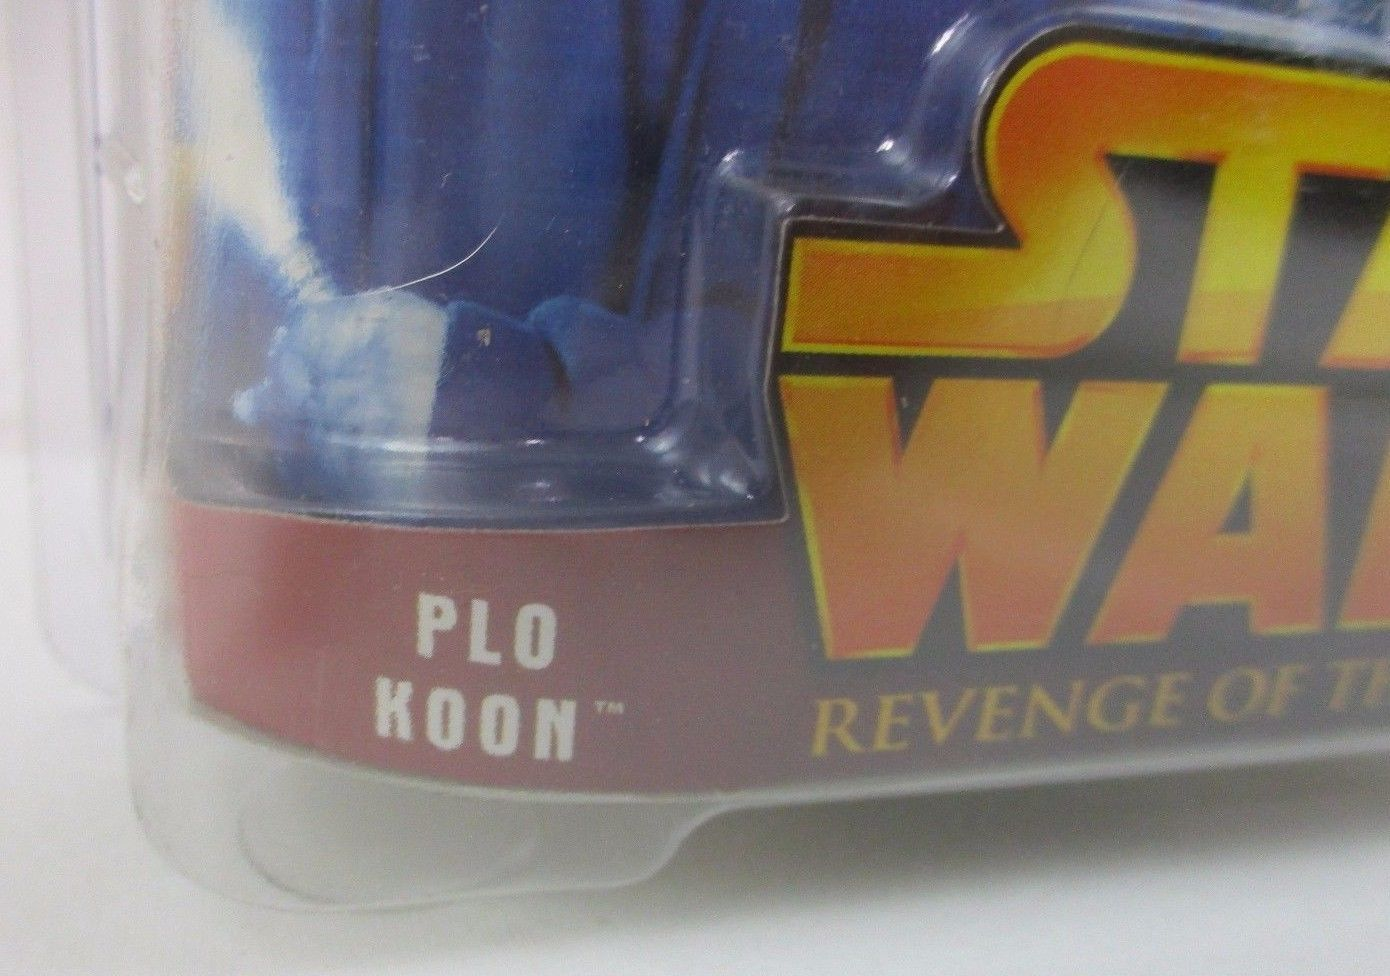 star wars revenge of the sith jedi hologram transmission plo koon figure image 2